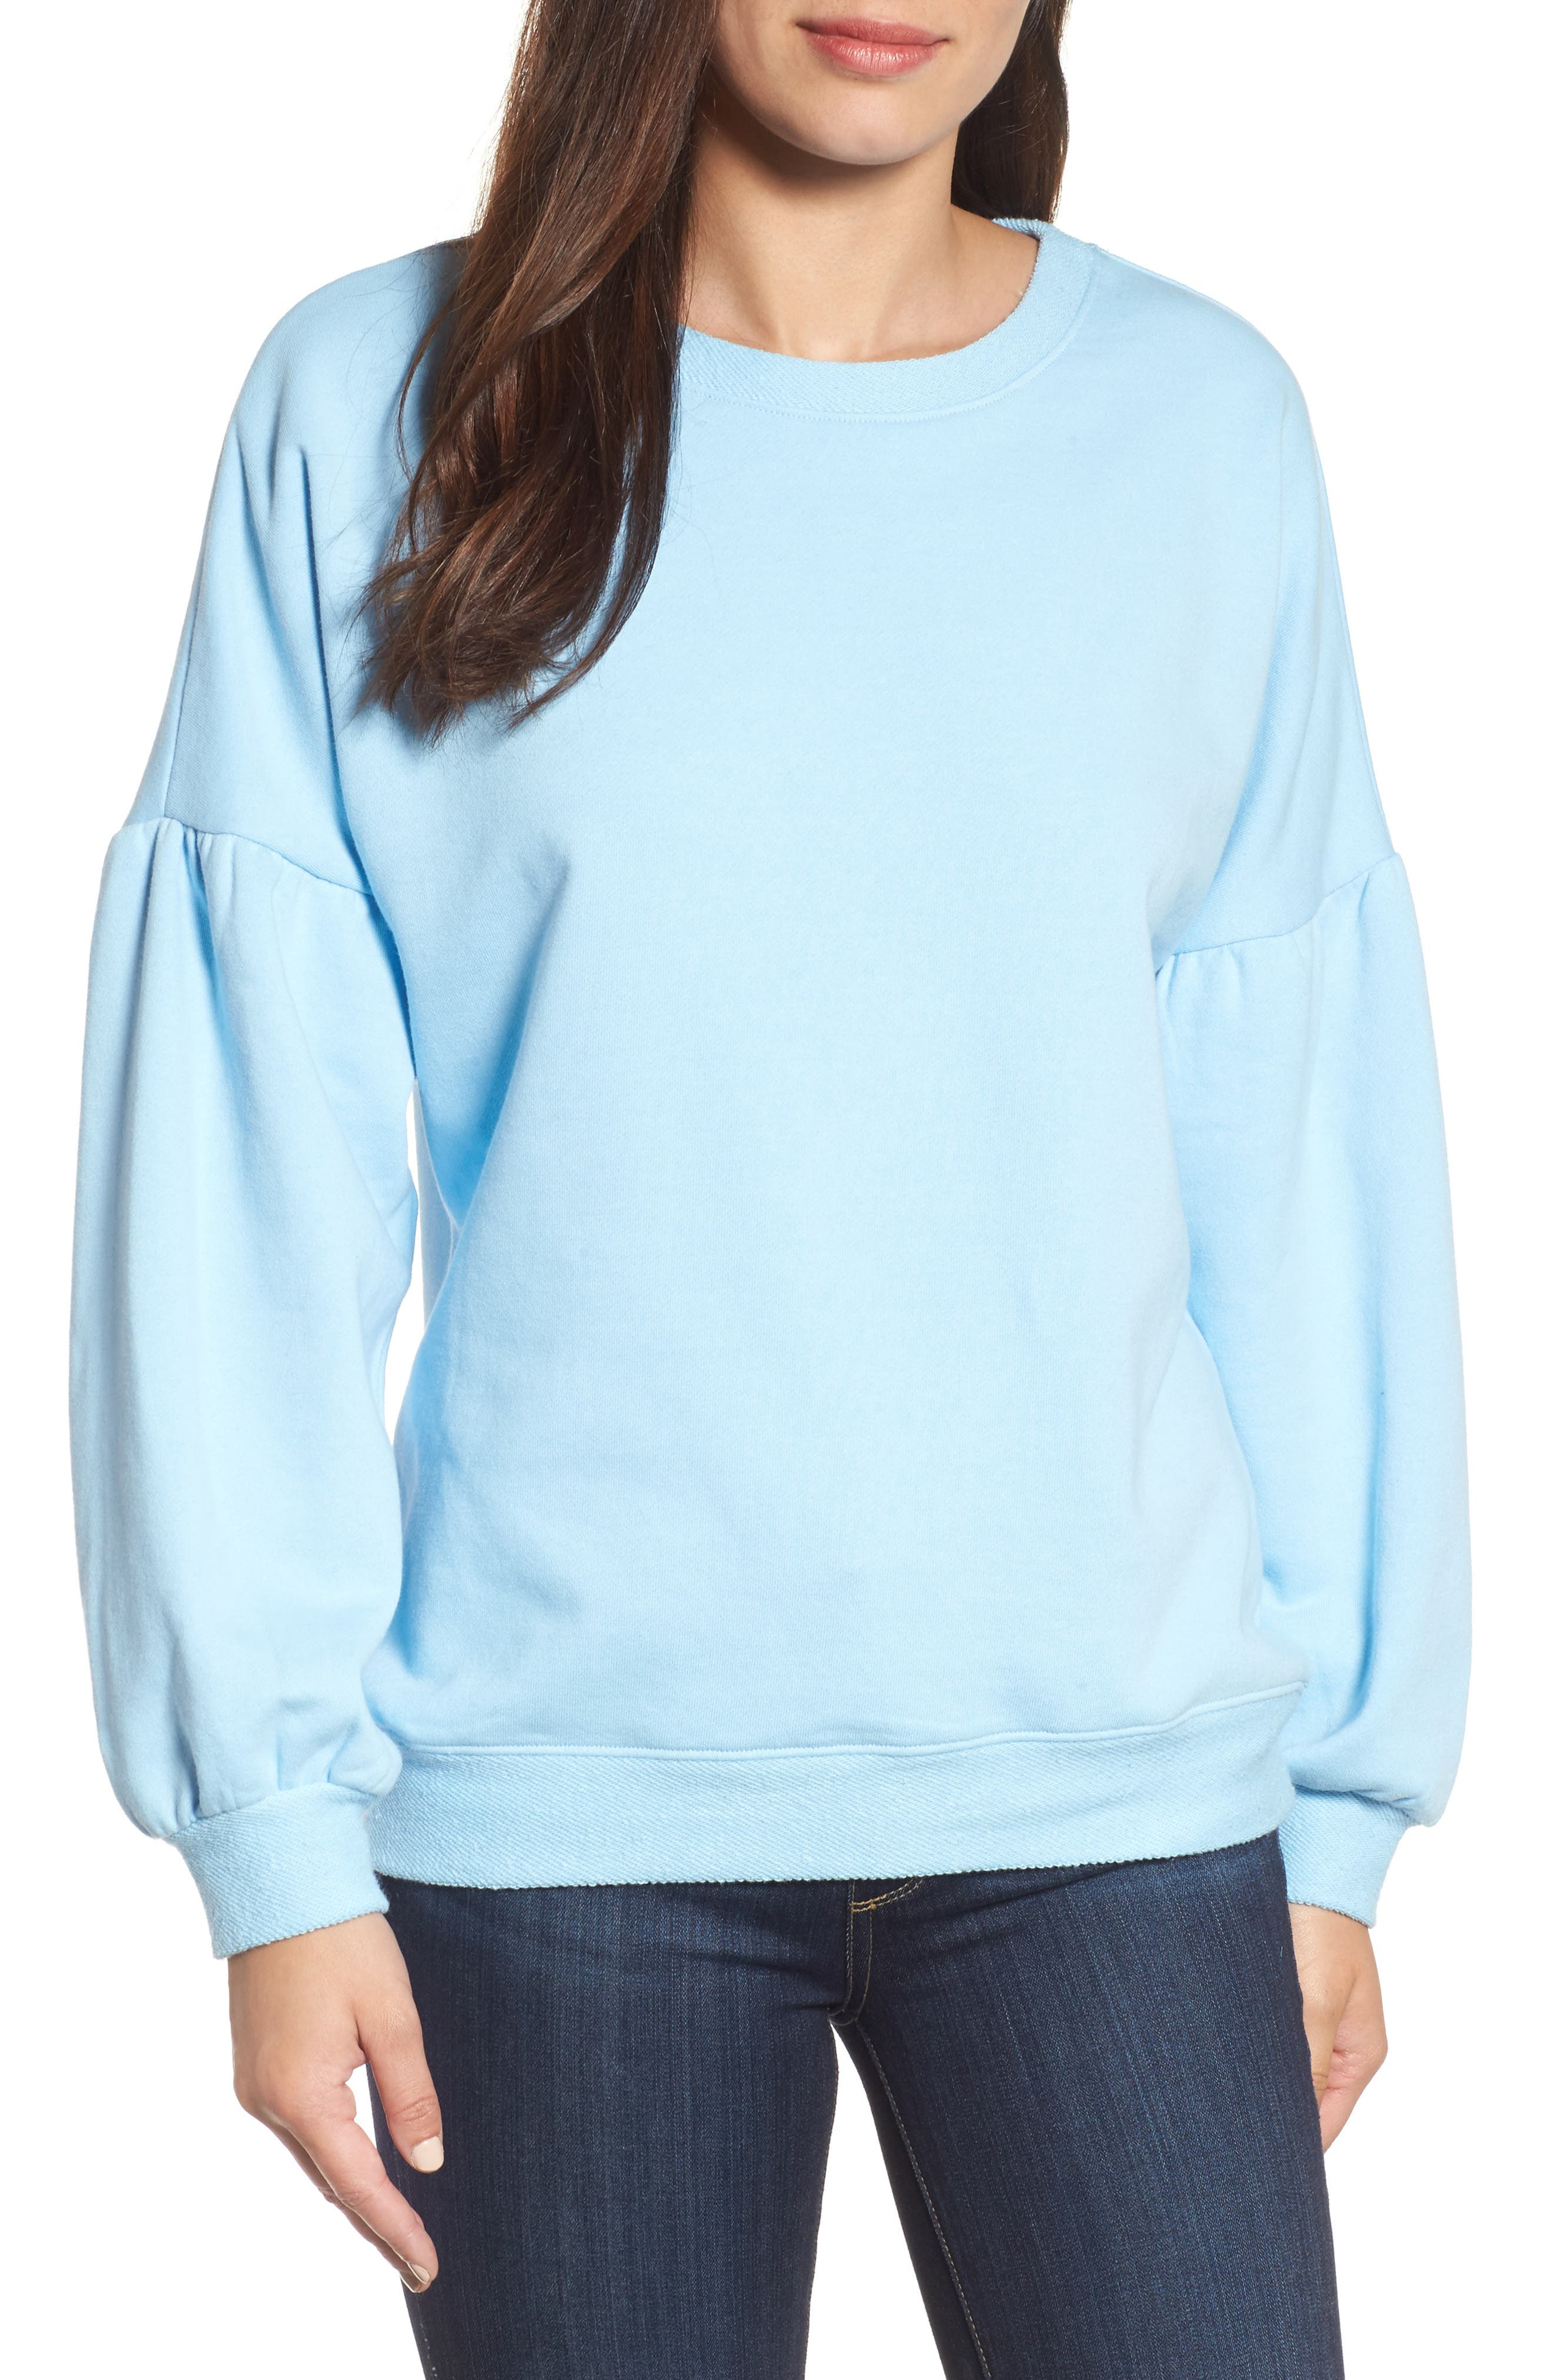 Allesia Sweatshirt,                             Main thumbnail 1, color,                             425